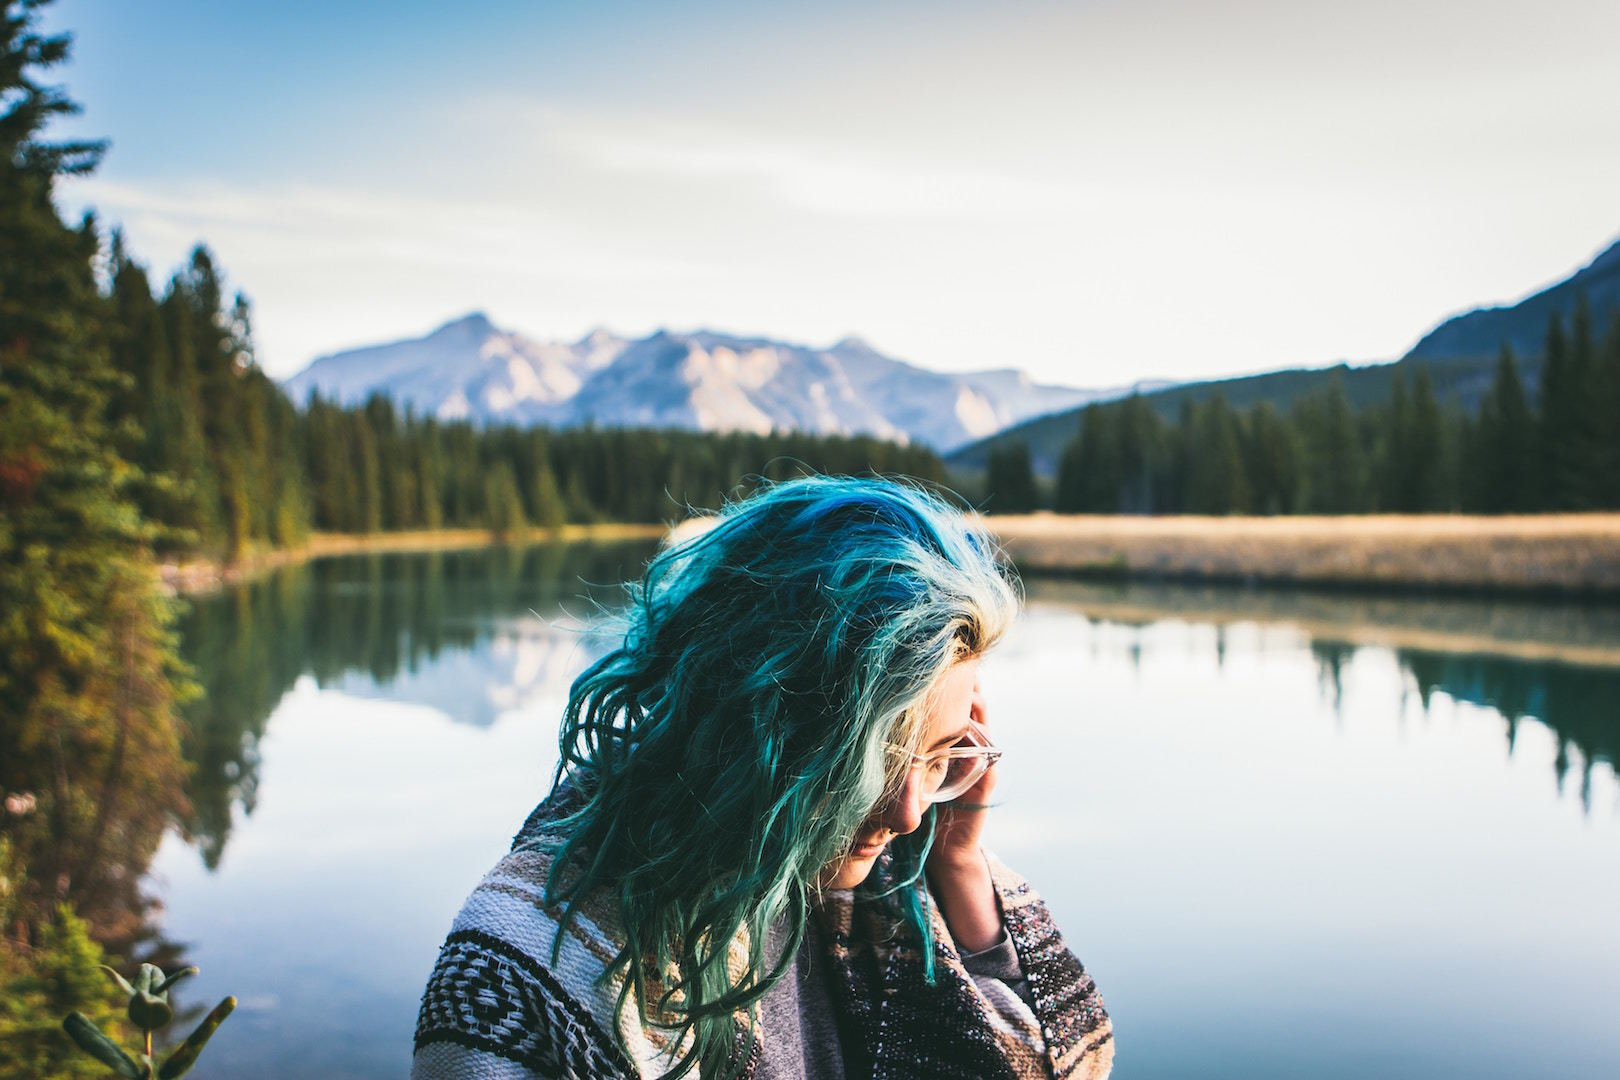 denim hair color: waves